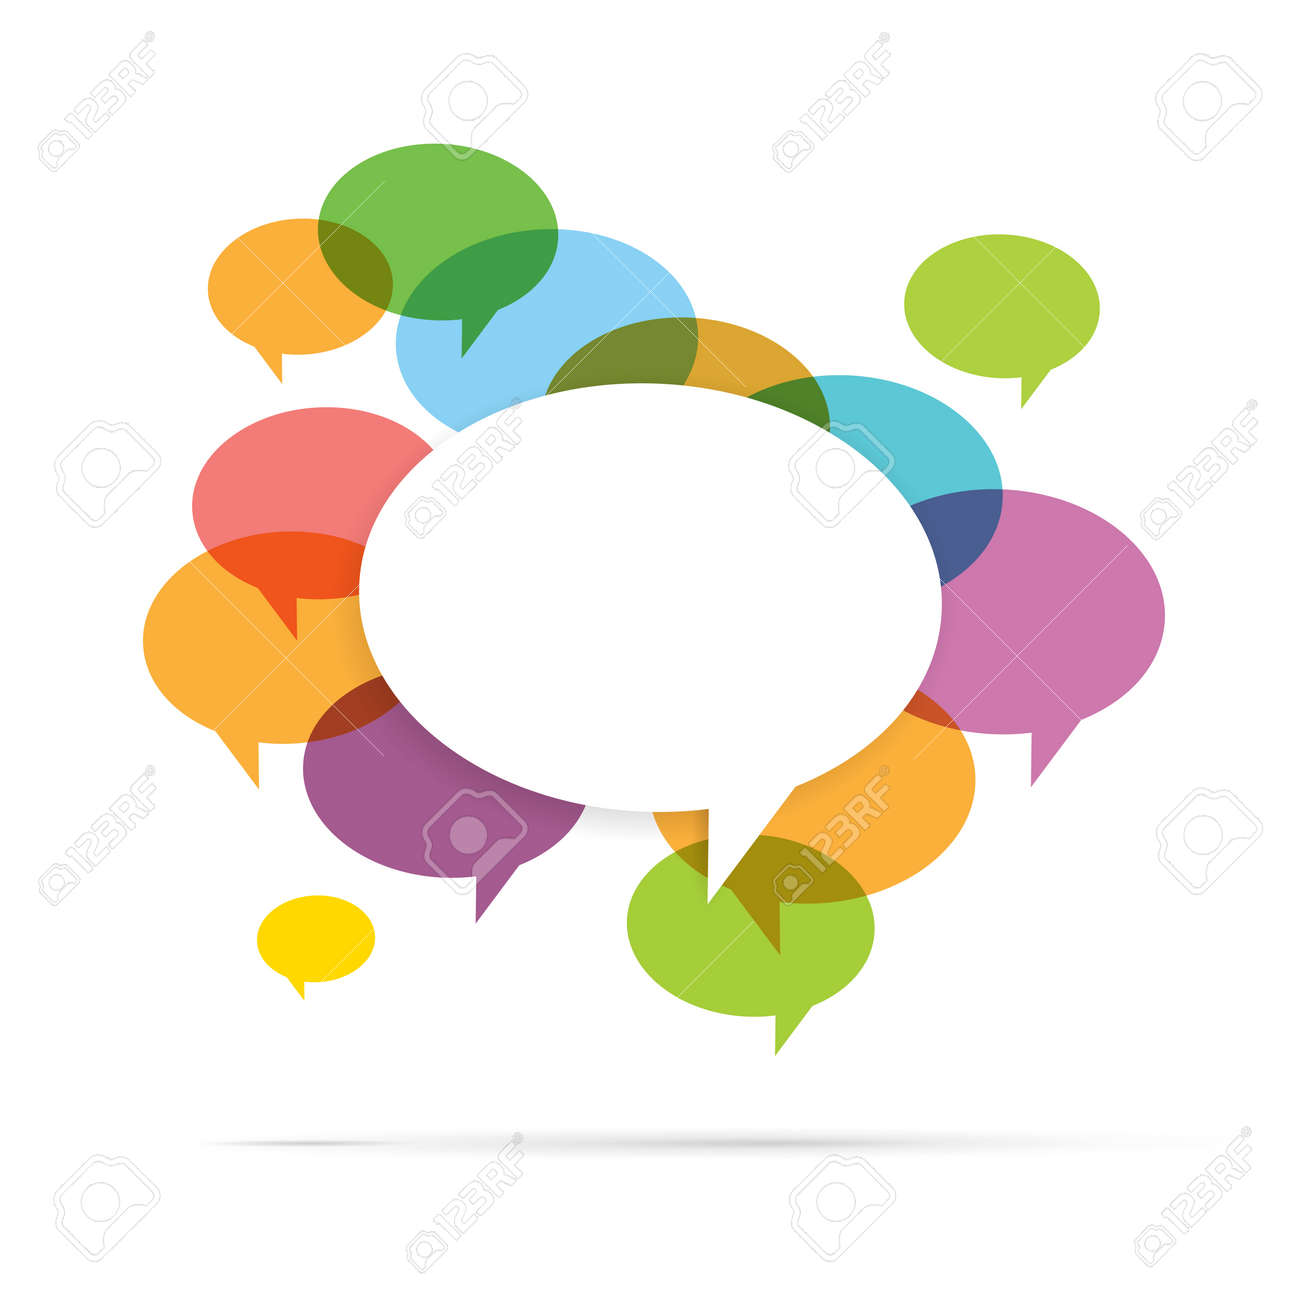 Vector illustration of colorful speech bubble copyspace. - 25211396